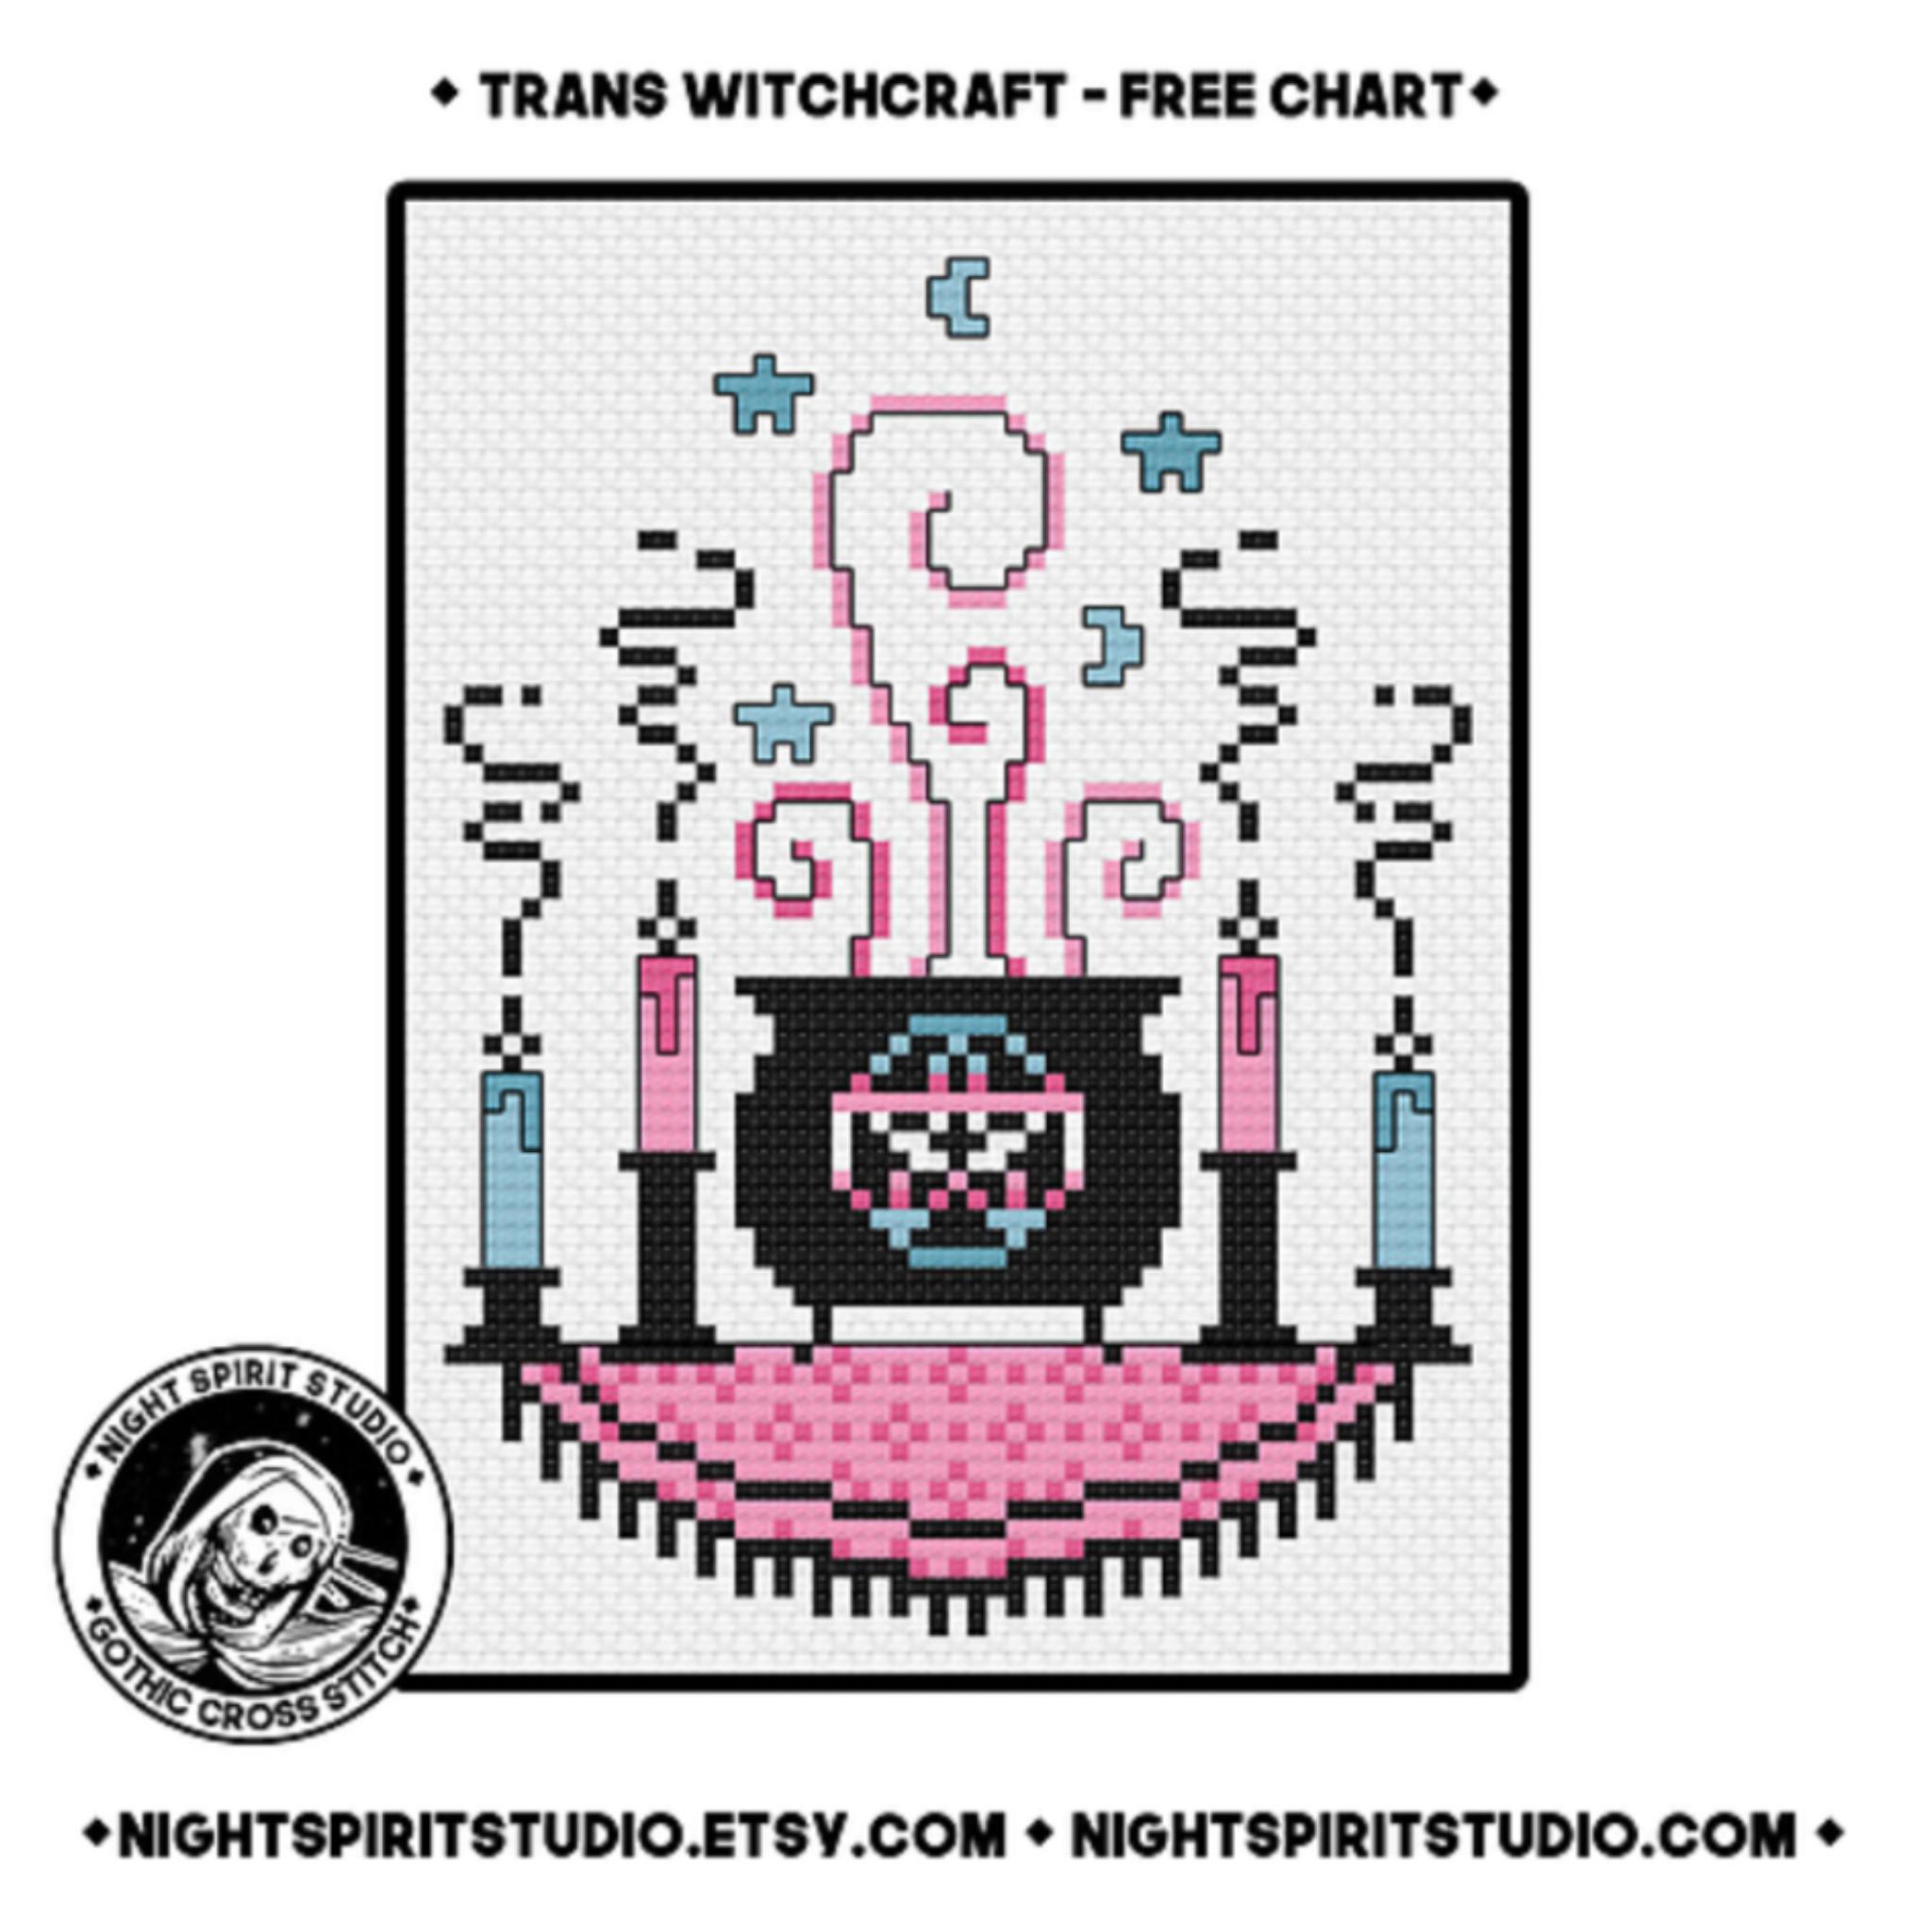 Trans Witchcraft